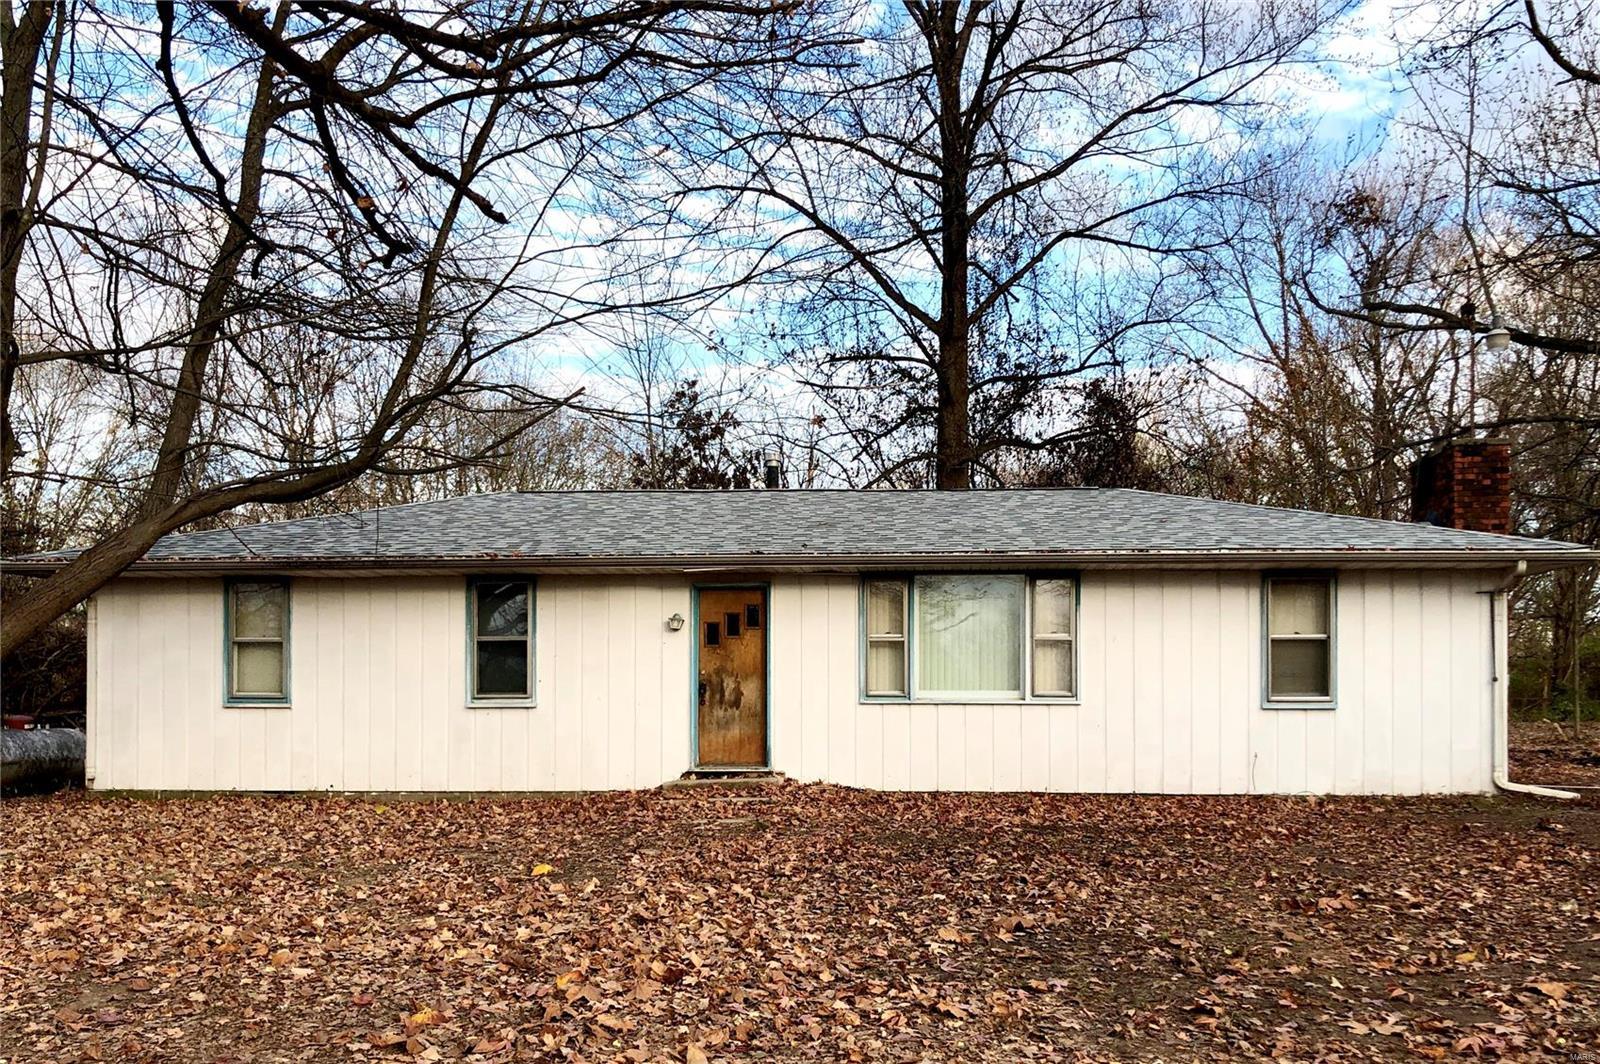 7280 Illinois 127 Property Photo - Murphysboro, IL real estate listing